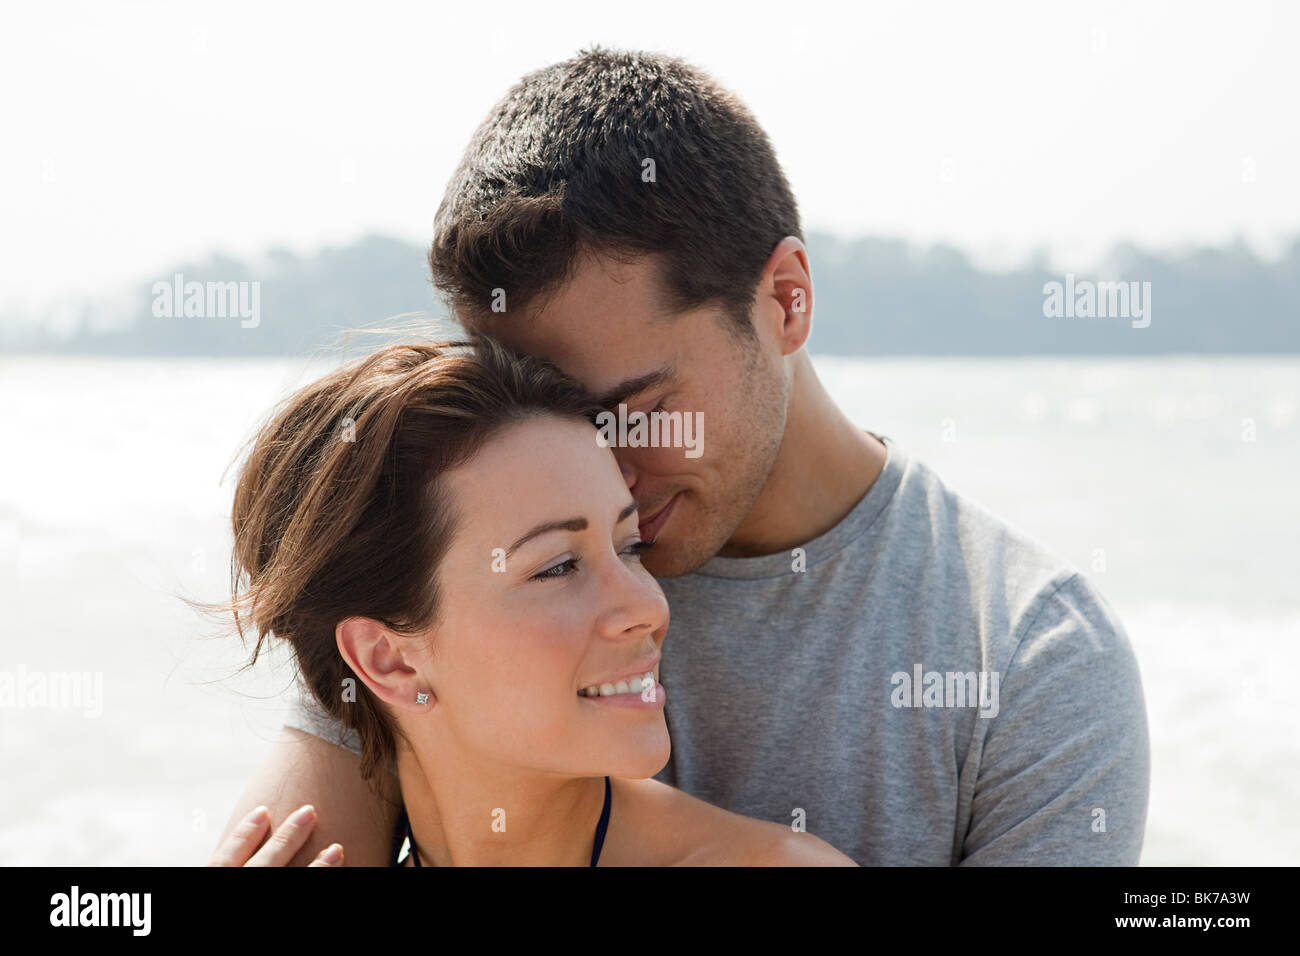 Casal amorosa pelo mar Imagens de Stock